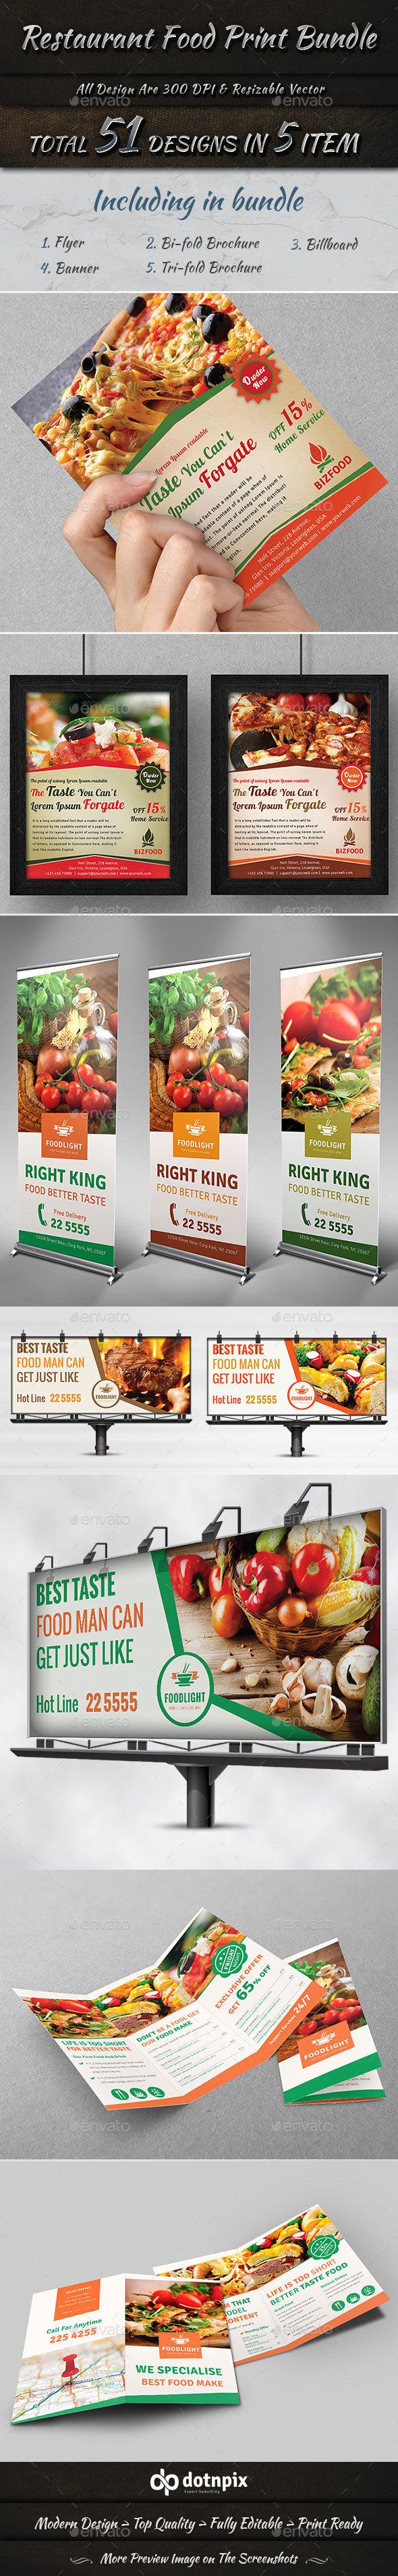 Restaurant Food Print Bundle